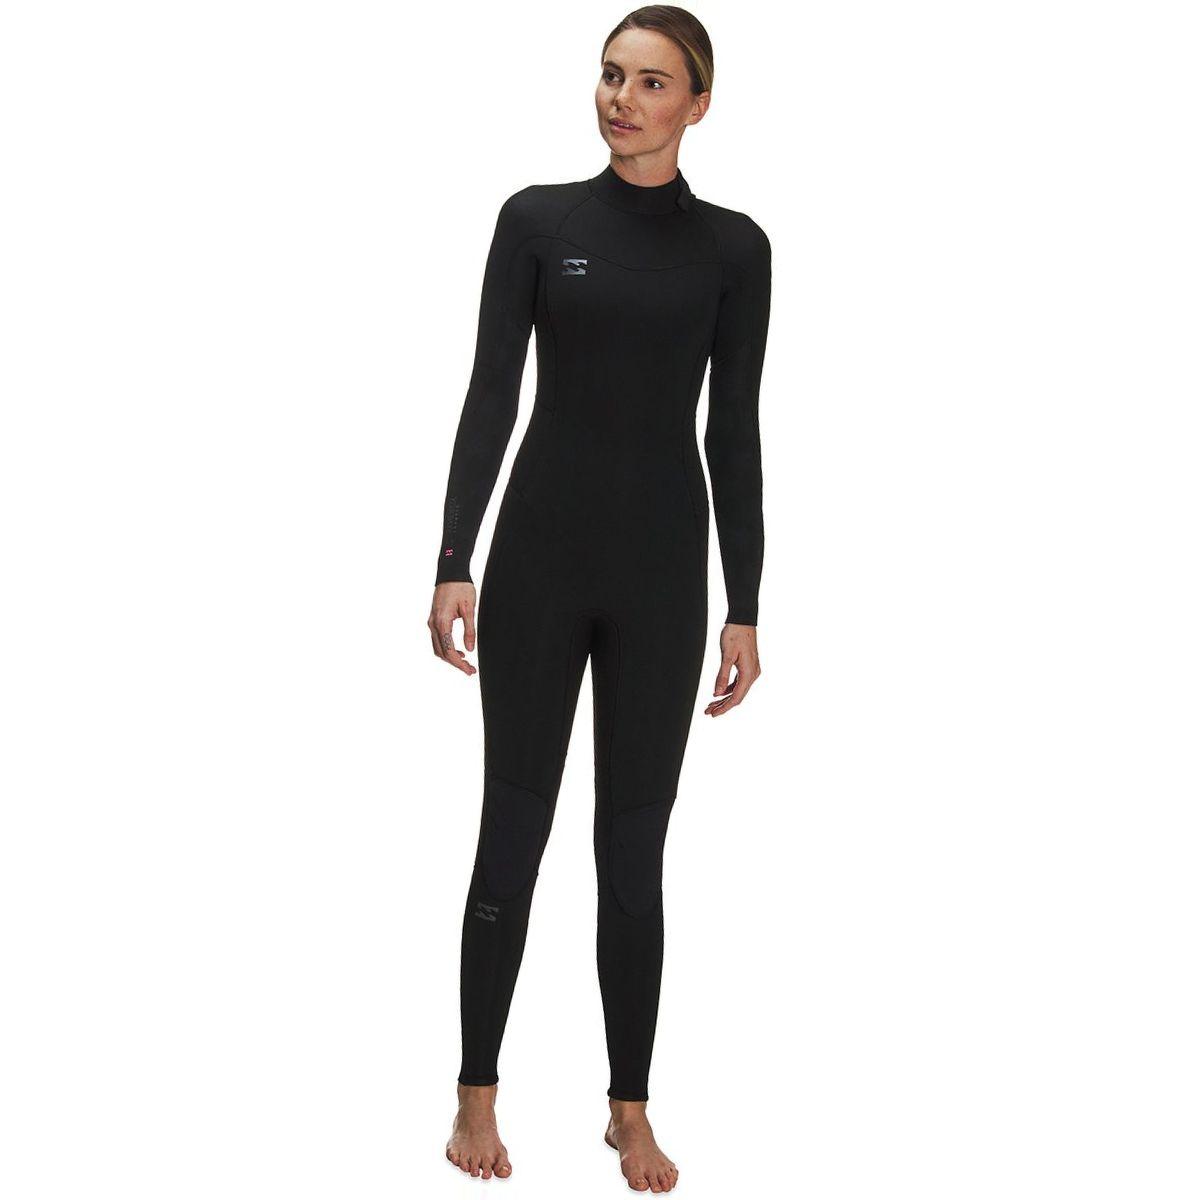 Billabong 4/3 Furnace Synergy Back-Zip Full Wetsuit - Women's